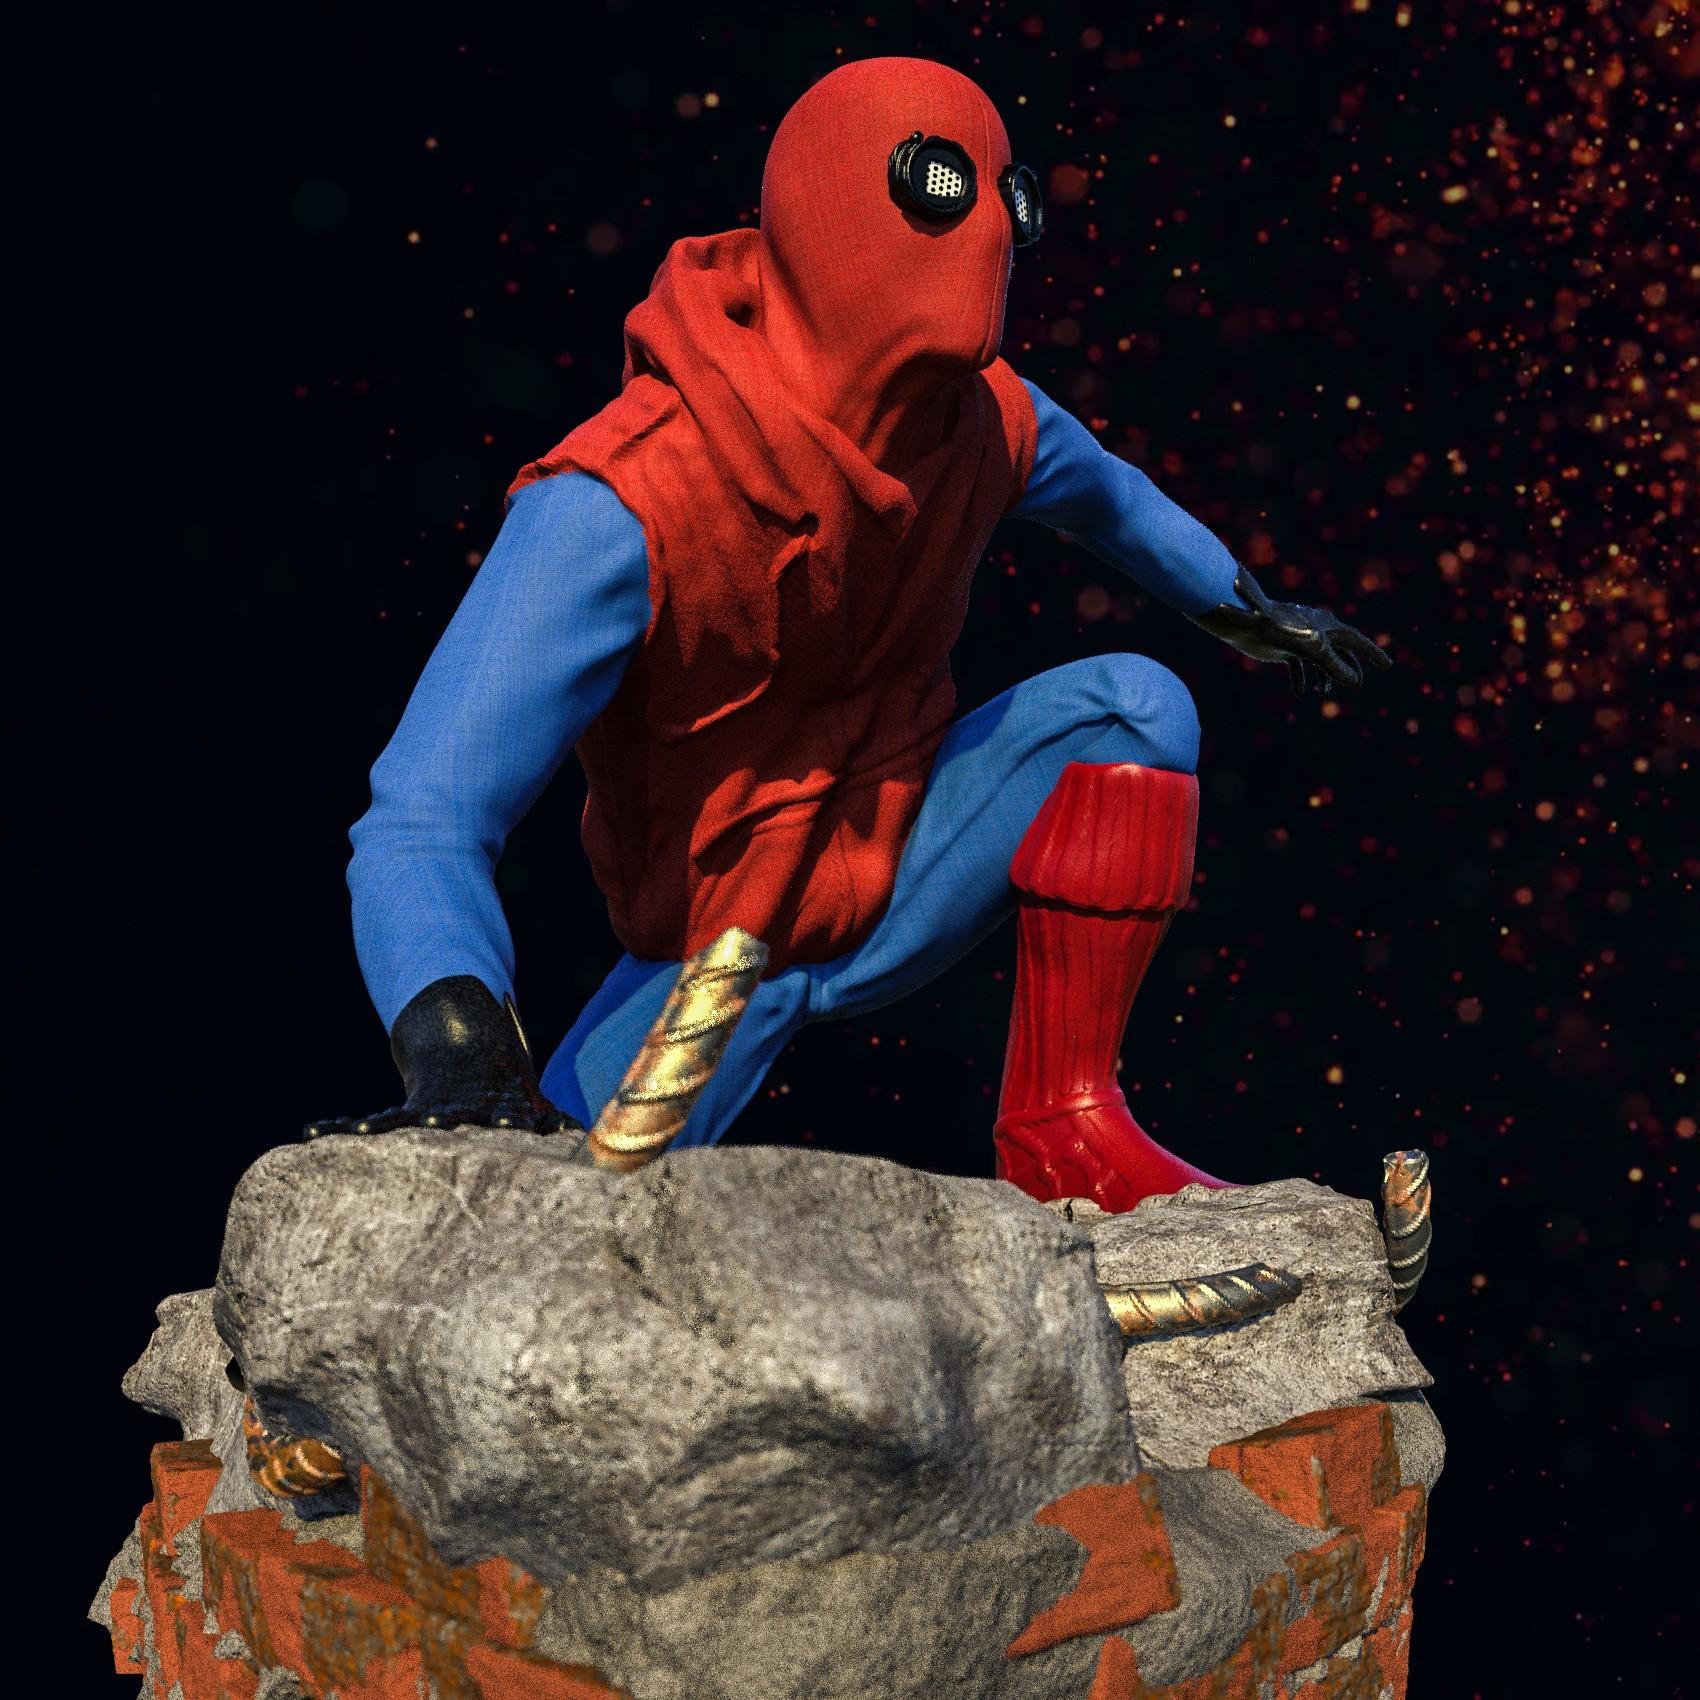 12.jpg Download STL file Spider-Man Homemade Suit • Design to 3D print, tolgaaxu